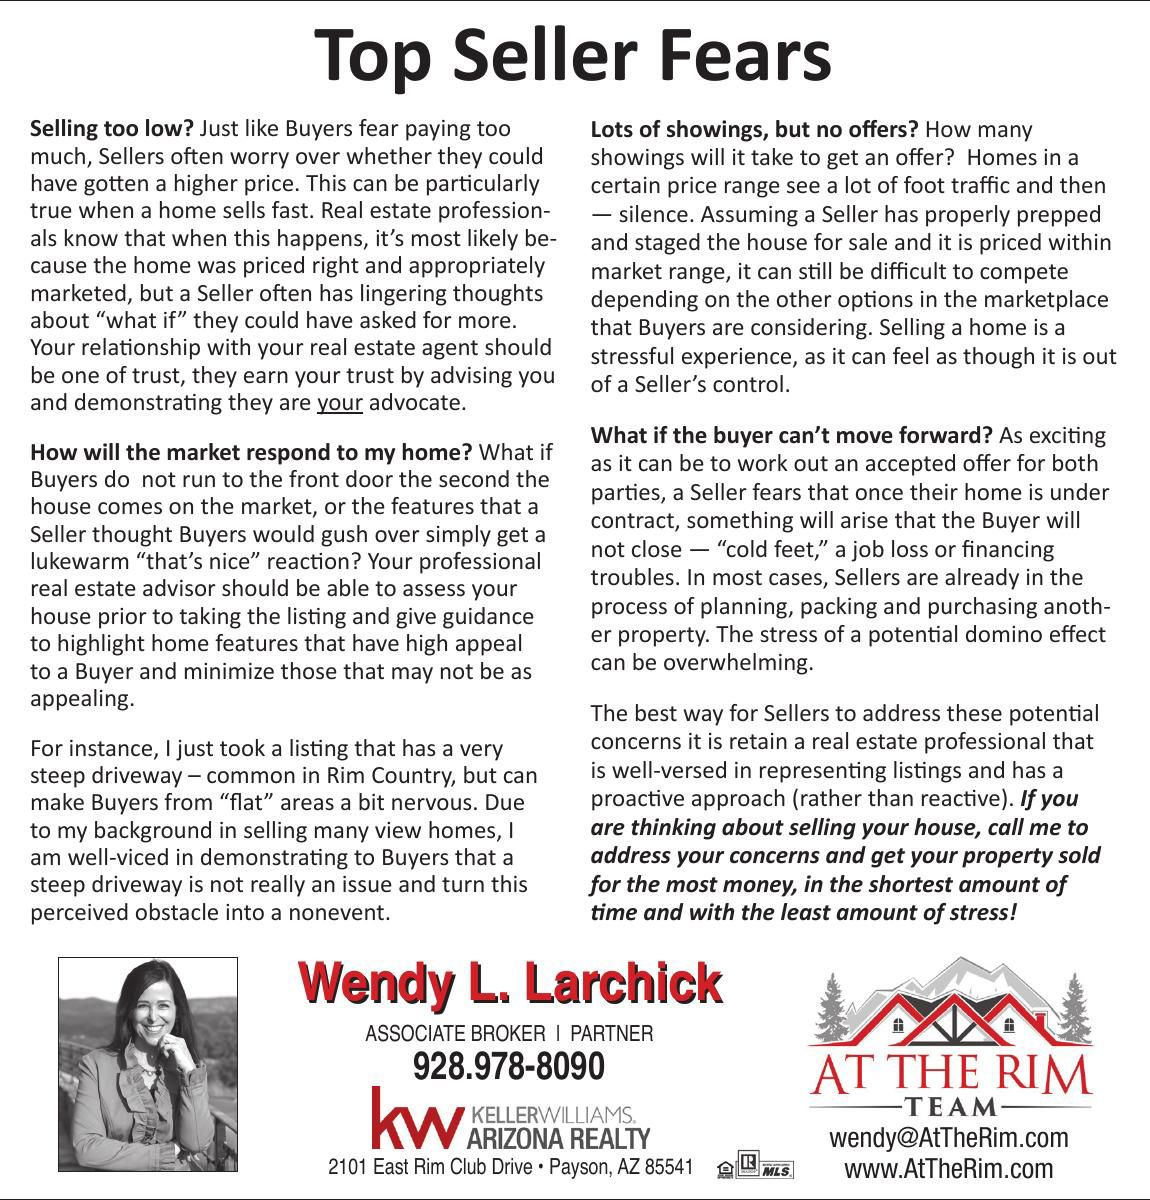 Wendy L. Larchick - Keller Williams Arizona Reality